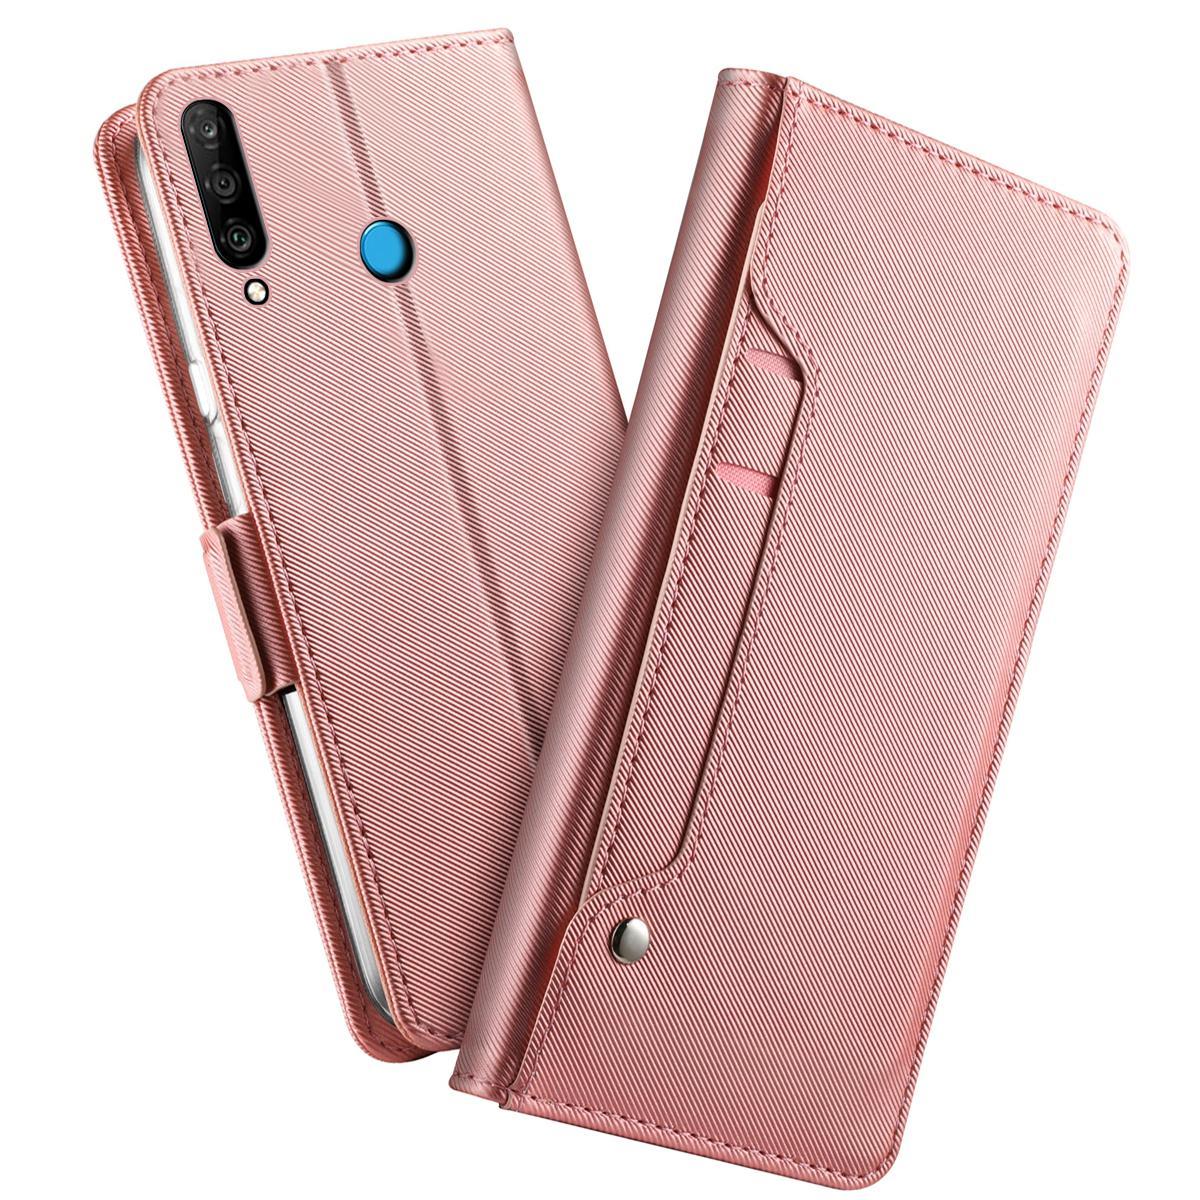 Suojakotelo Peili Huawei P30 Lite Vaaleanpunainen